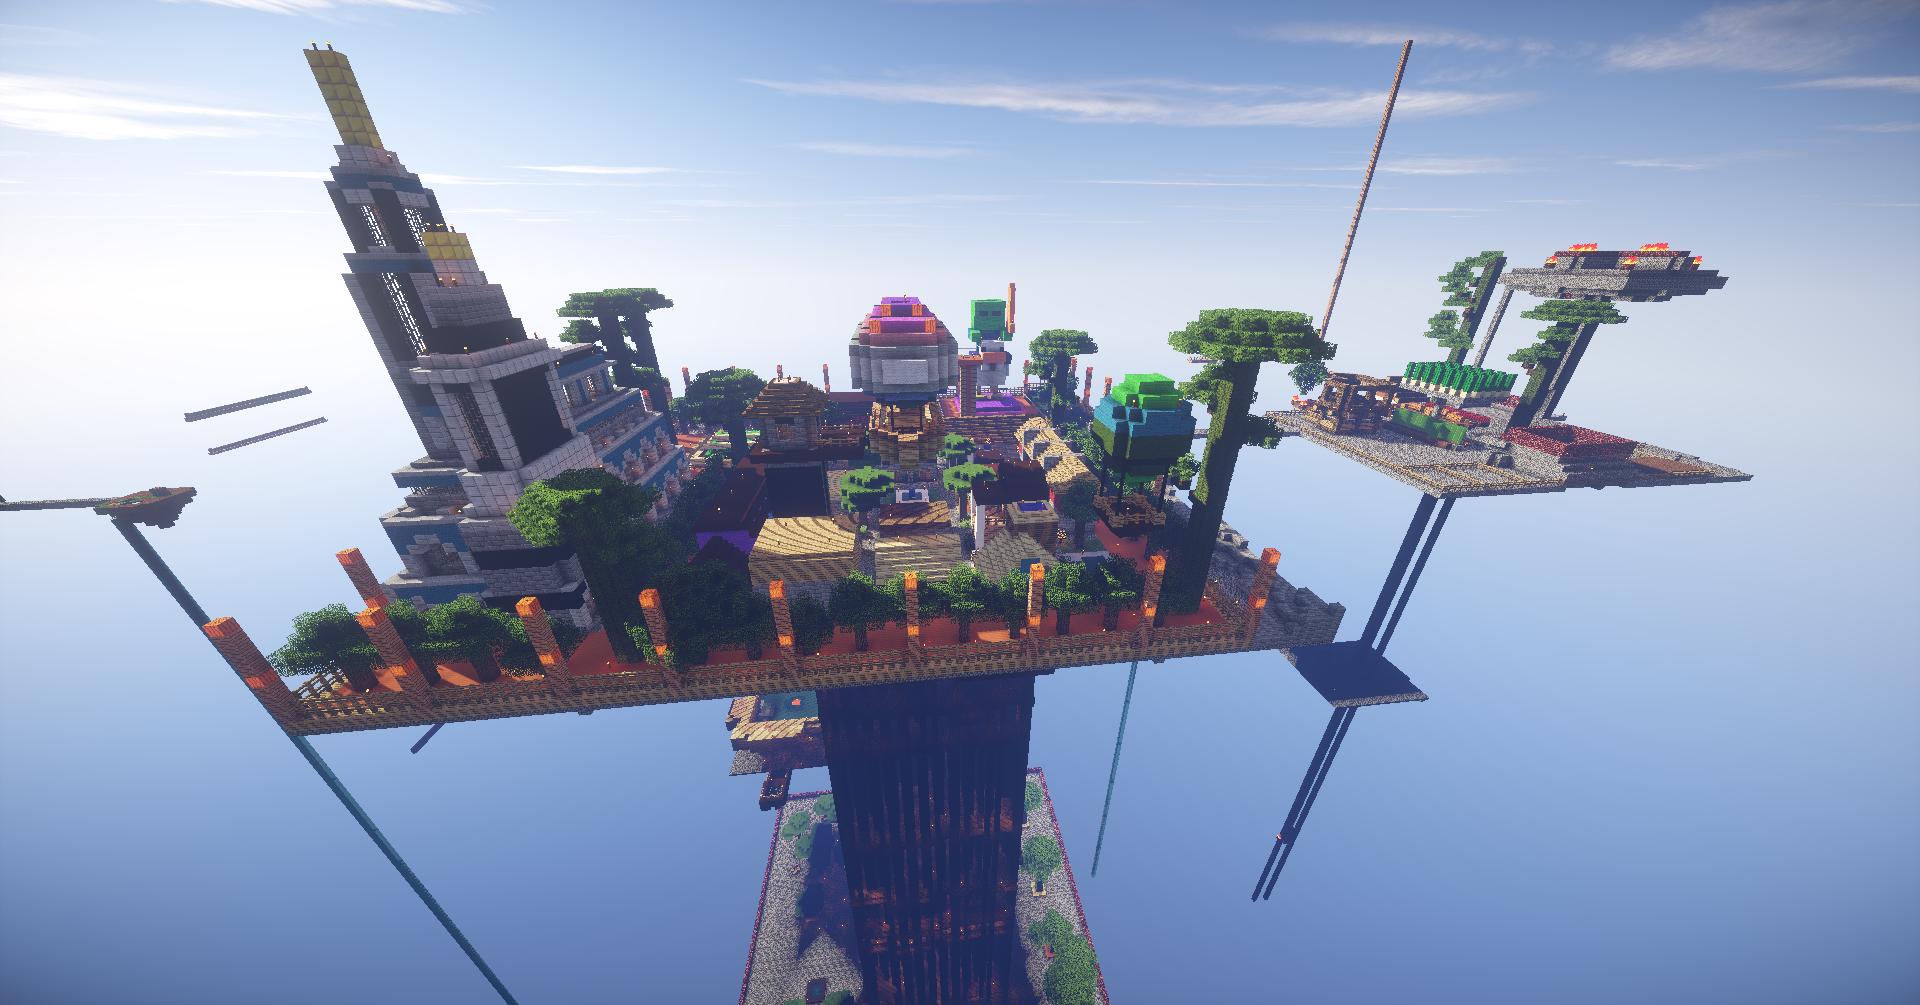 Minecraft Original Skyblock Server - Muat Turun i